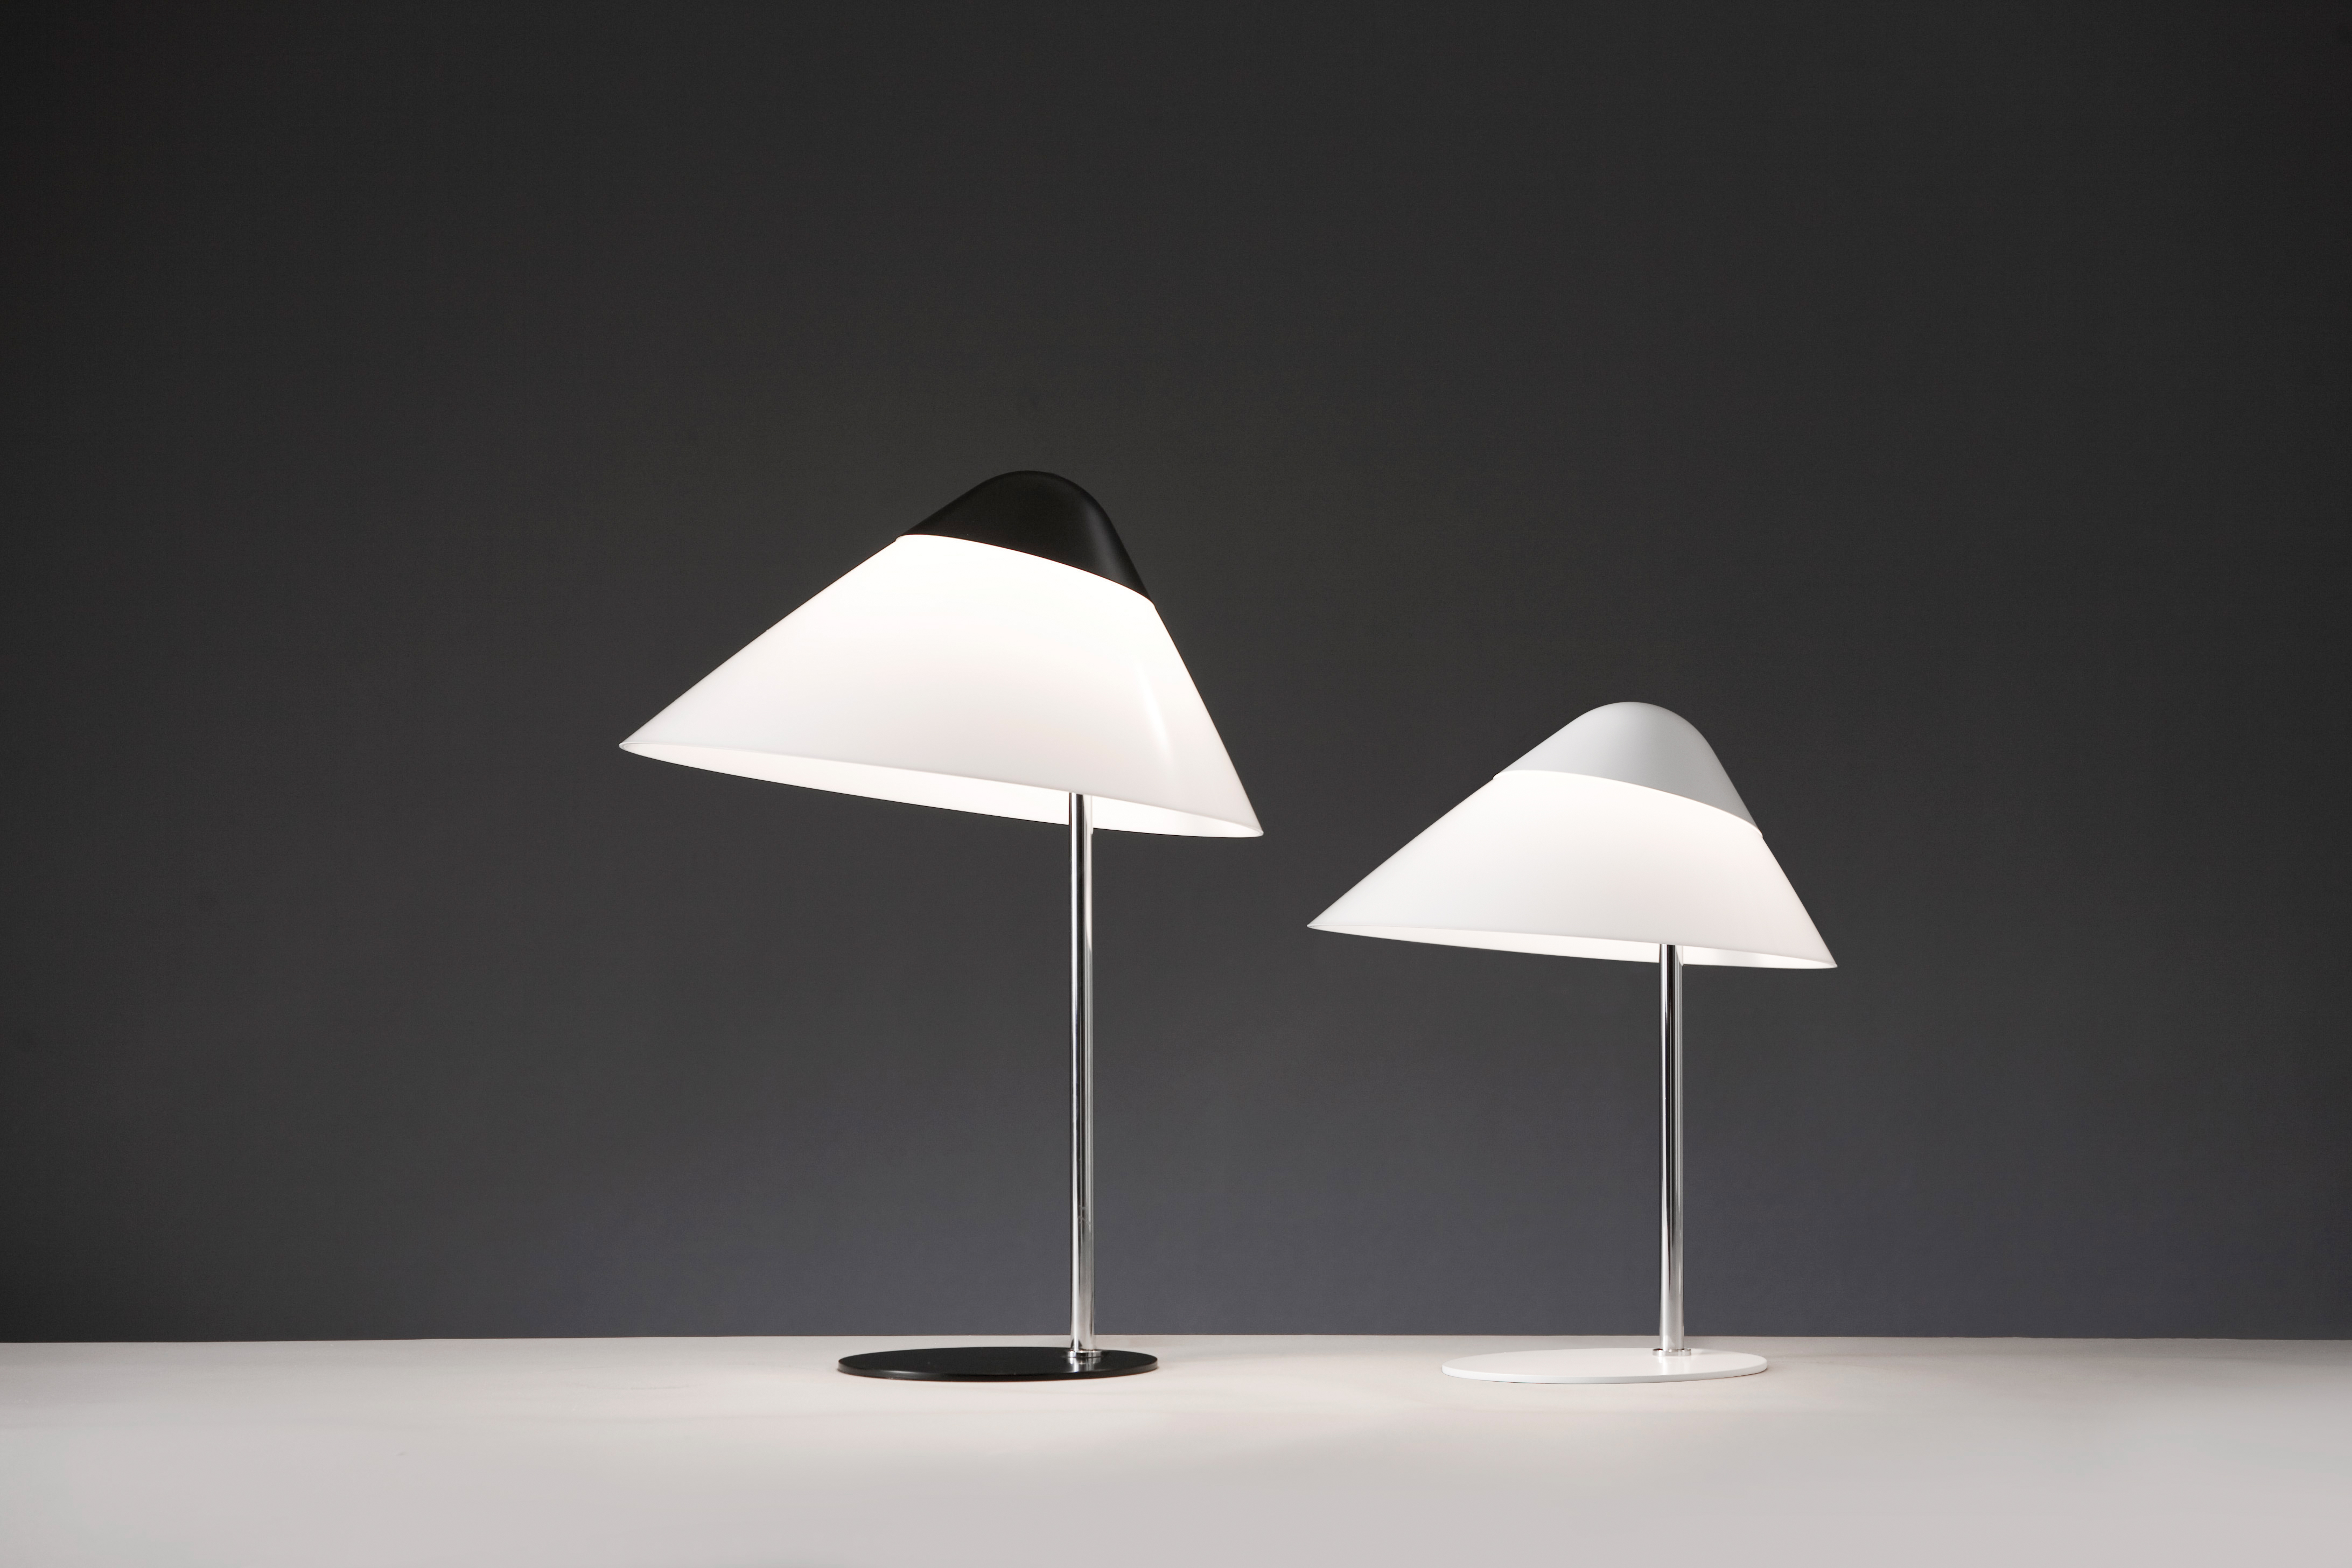 Velsete lampe de table Opala, Hans Wegner - Pandul FM-72